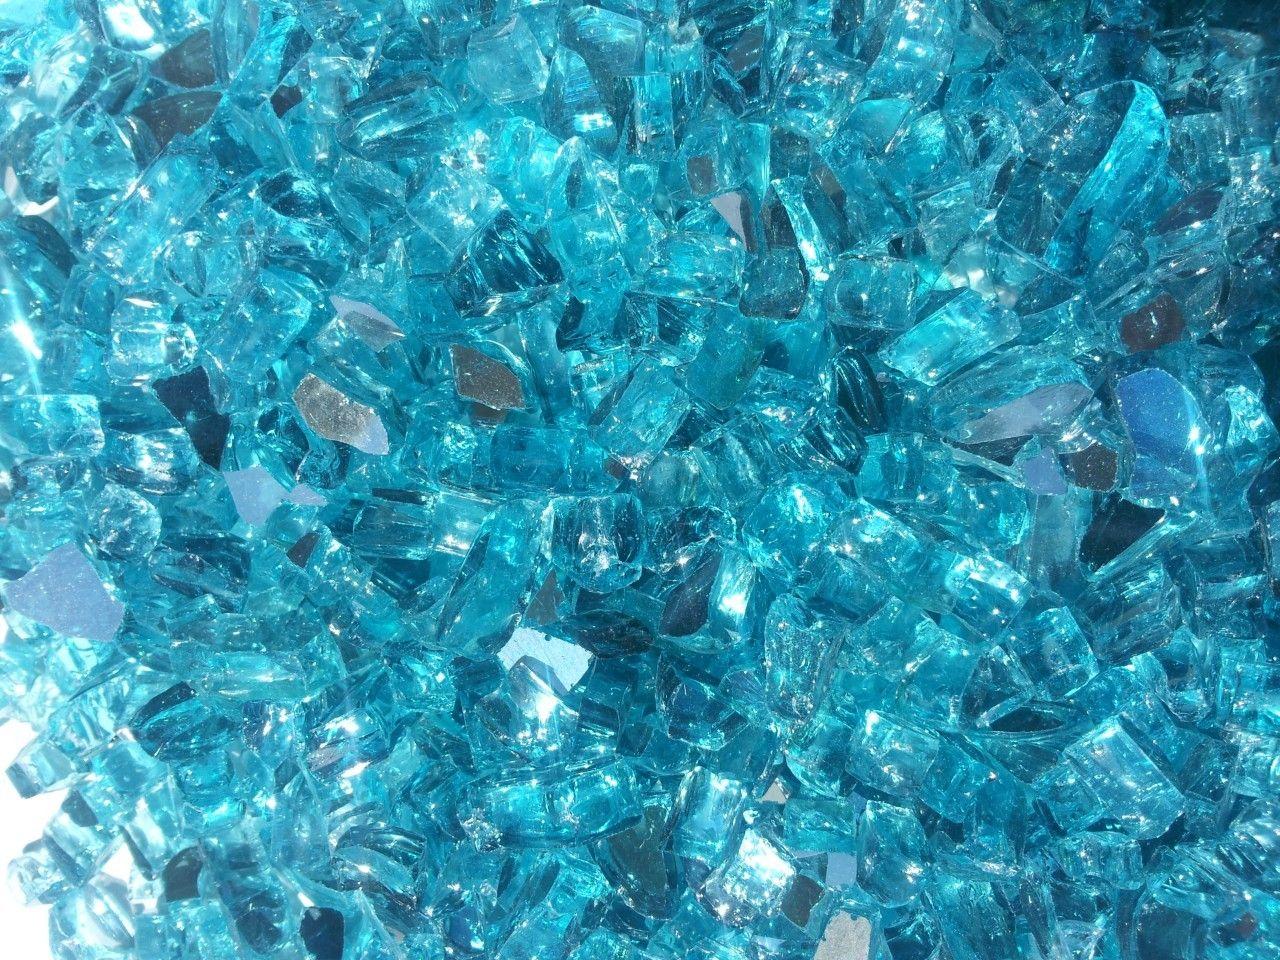 Fire On Glass - Caribbean Blue Metallic / Azuria Reflective per pound, $4.25 (http://www.fireonglass.com/caribbean-blue-metallic-azuria-reflective-per-pound/)